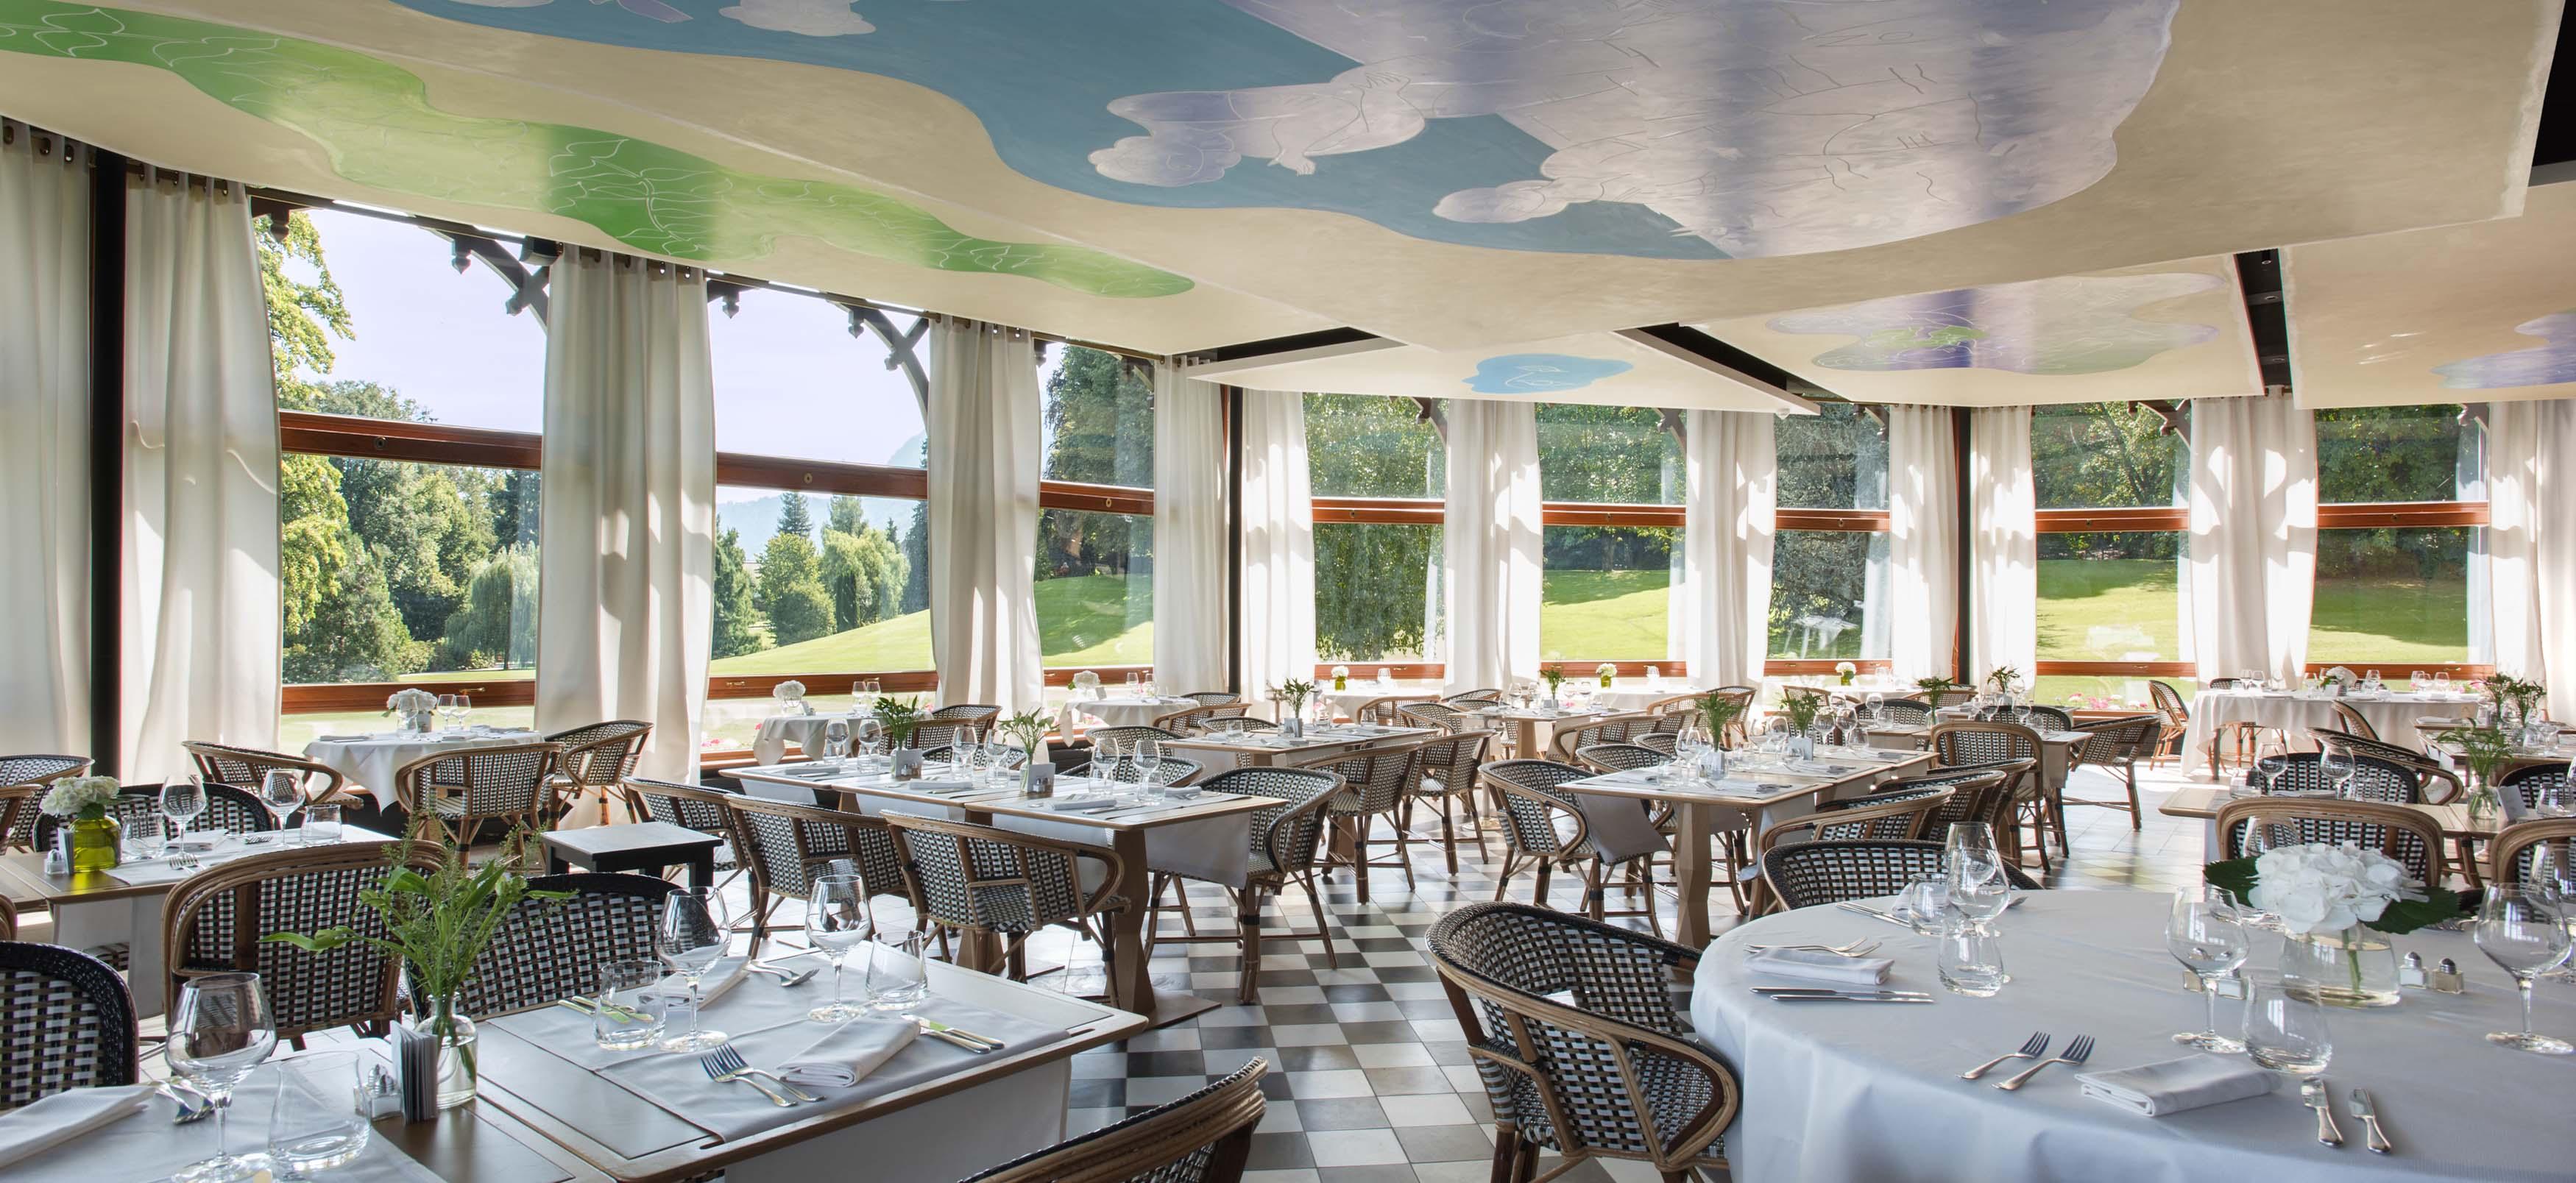 Hotel Ermitage Evian Royal Resort